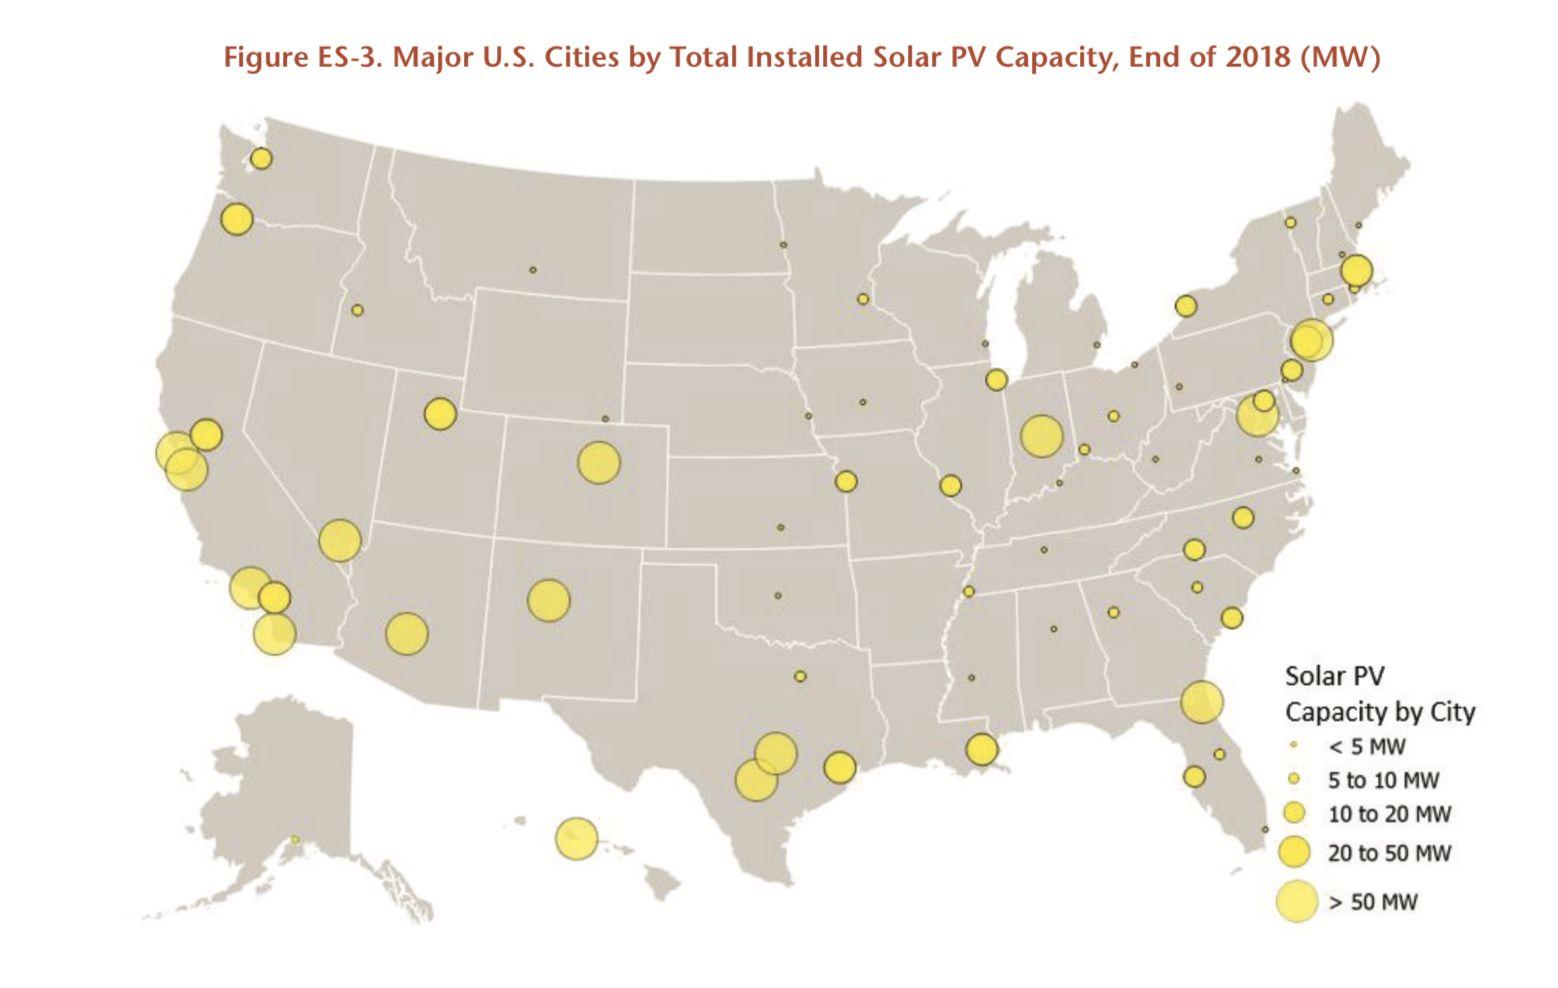 PV_installed_map_1558_988_80 U S Map Of Solar Gain on u.s. shale map, u.s. fracking map, u.s. coal map, u.s. power grid map, u.s. satellite map, u.s. natural gas map, u.s. oil map,